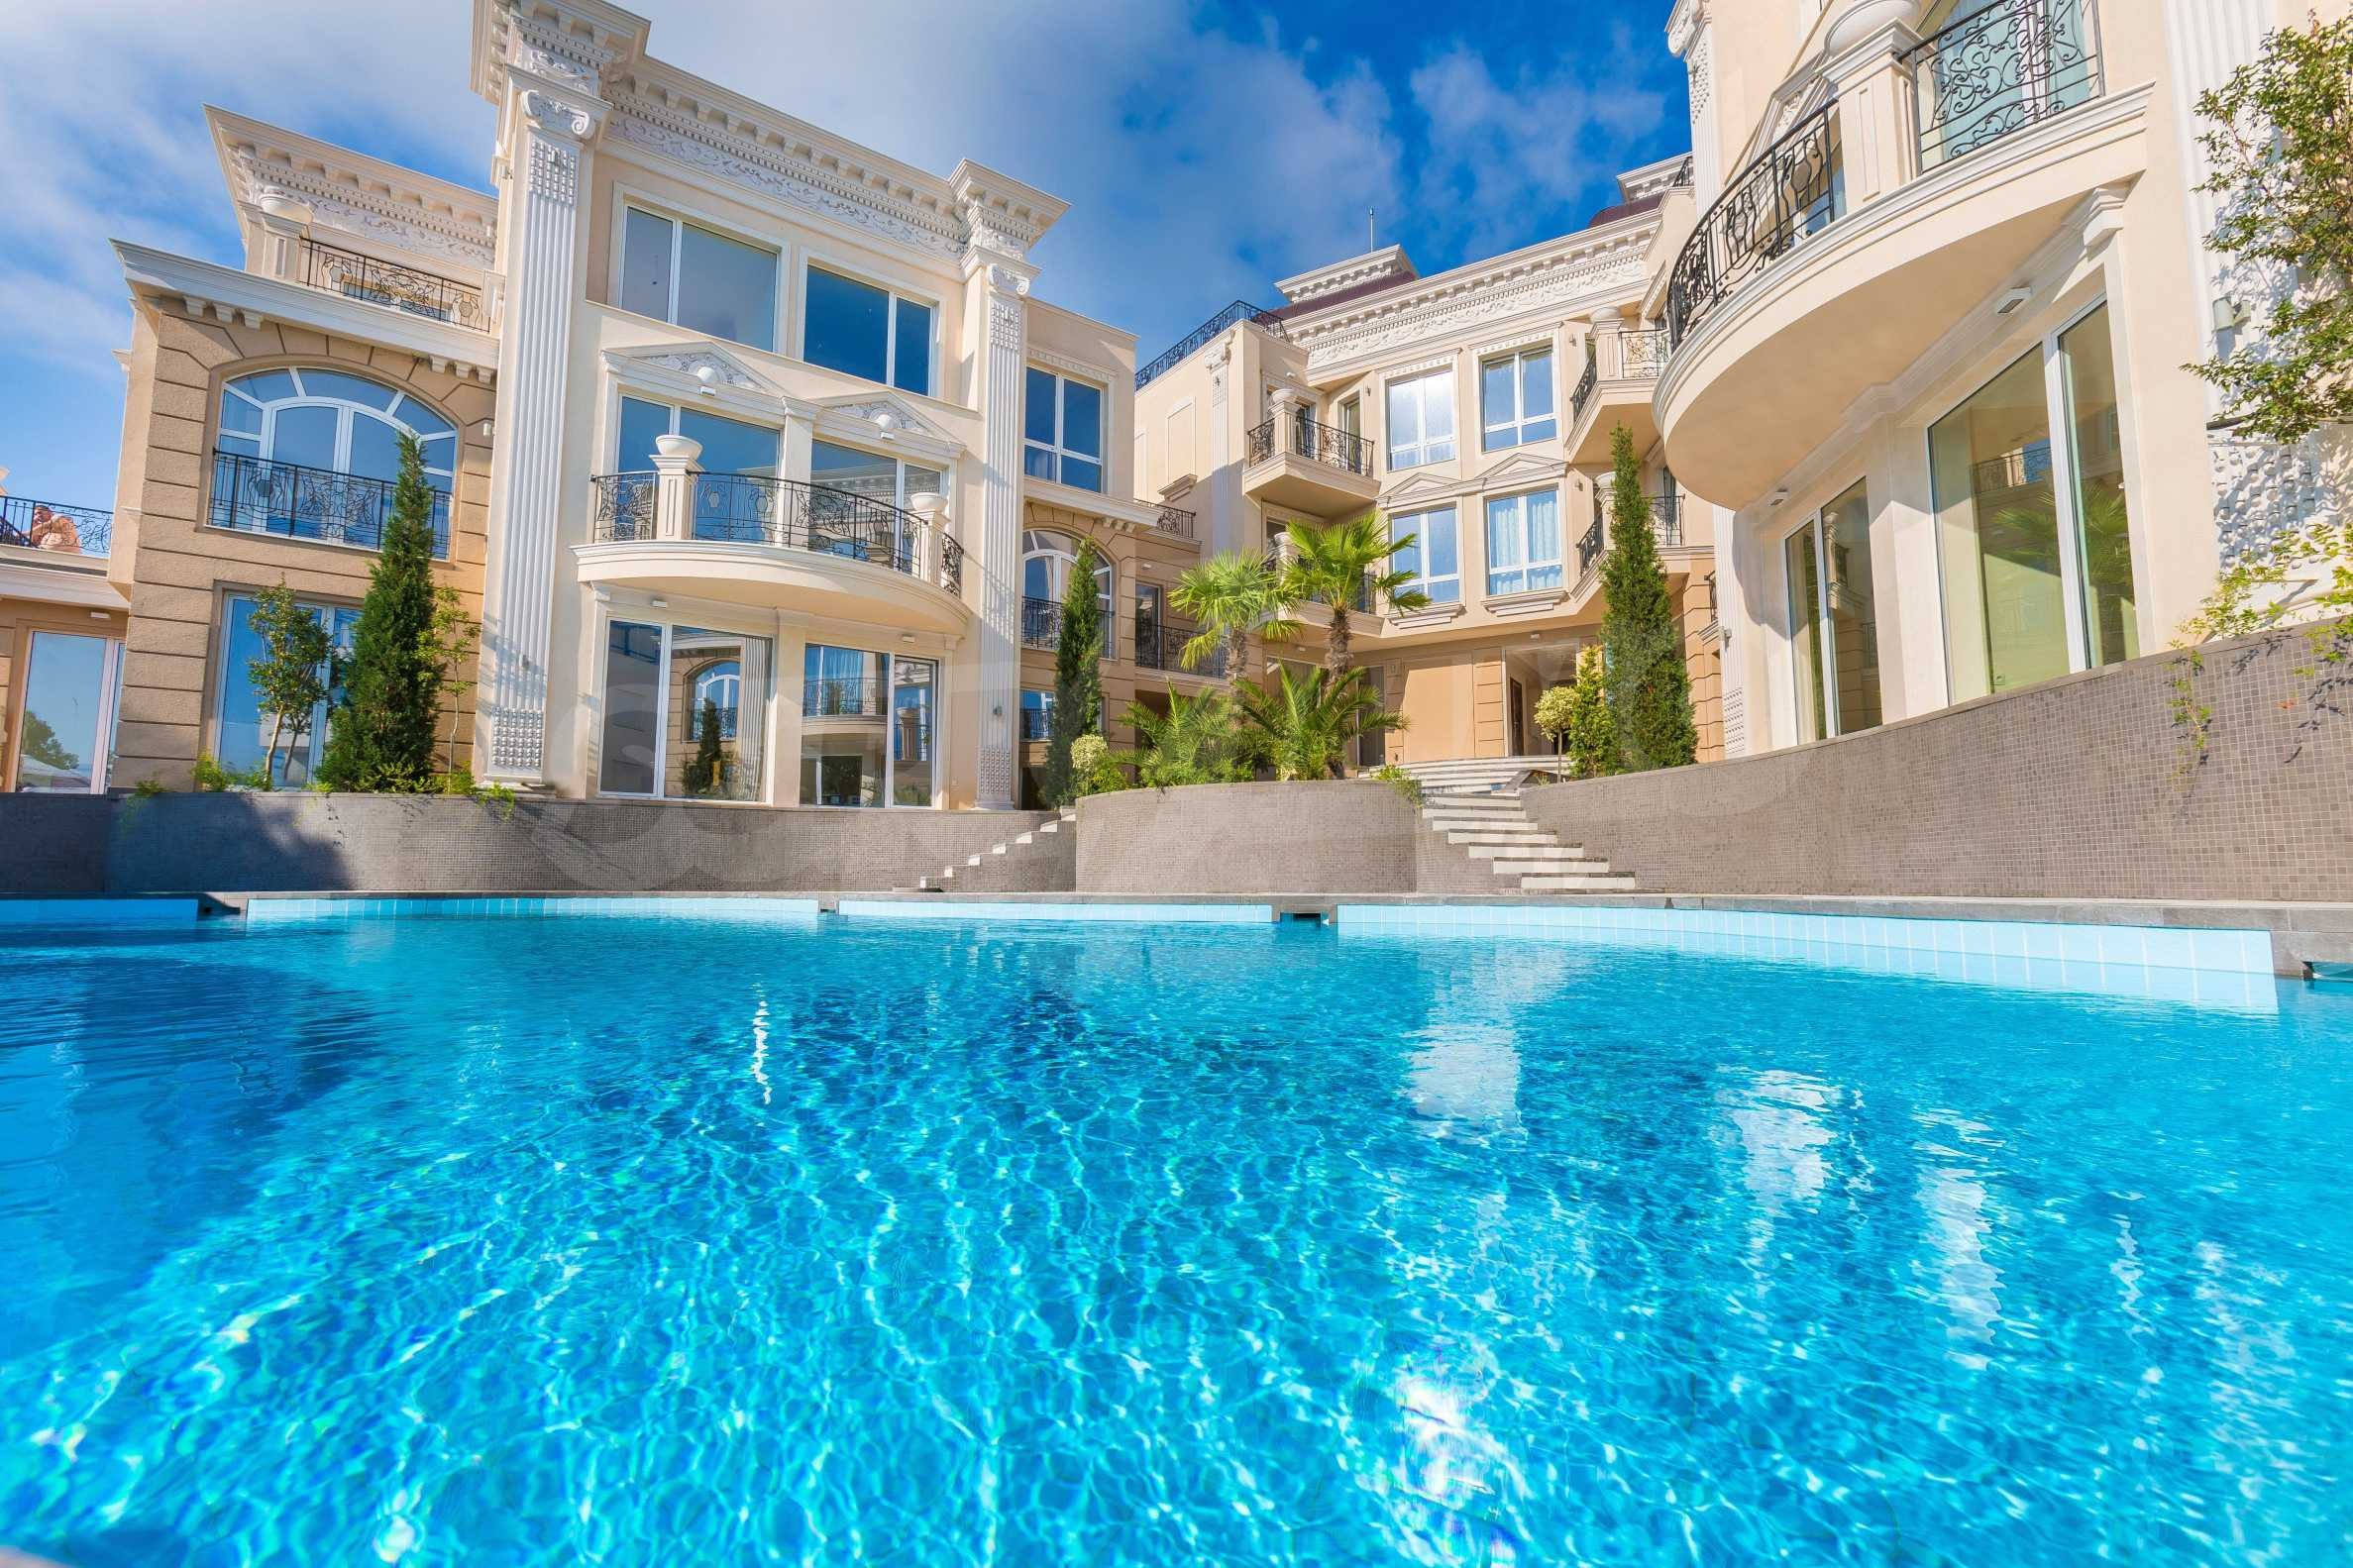 Първокласен двустаен апартамент в Belle Époque Beach Residence (ап. №A 206) 18